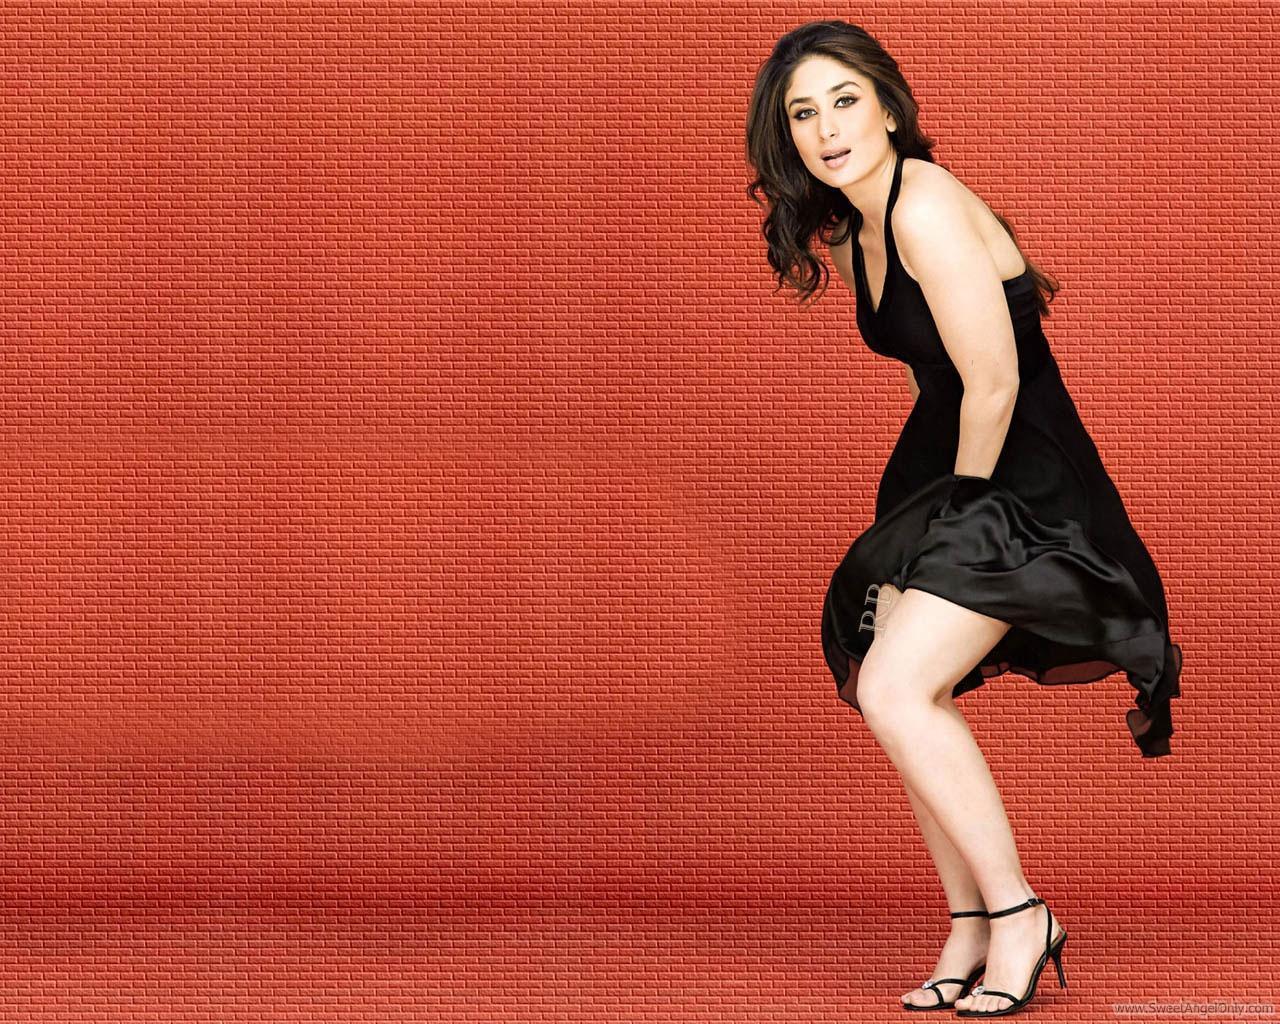 booty me now: kareena kapoor hd wallpapers-ra one